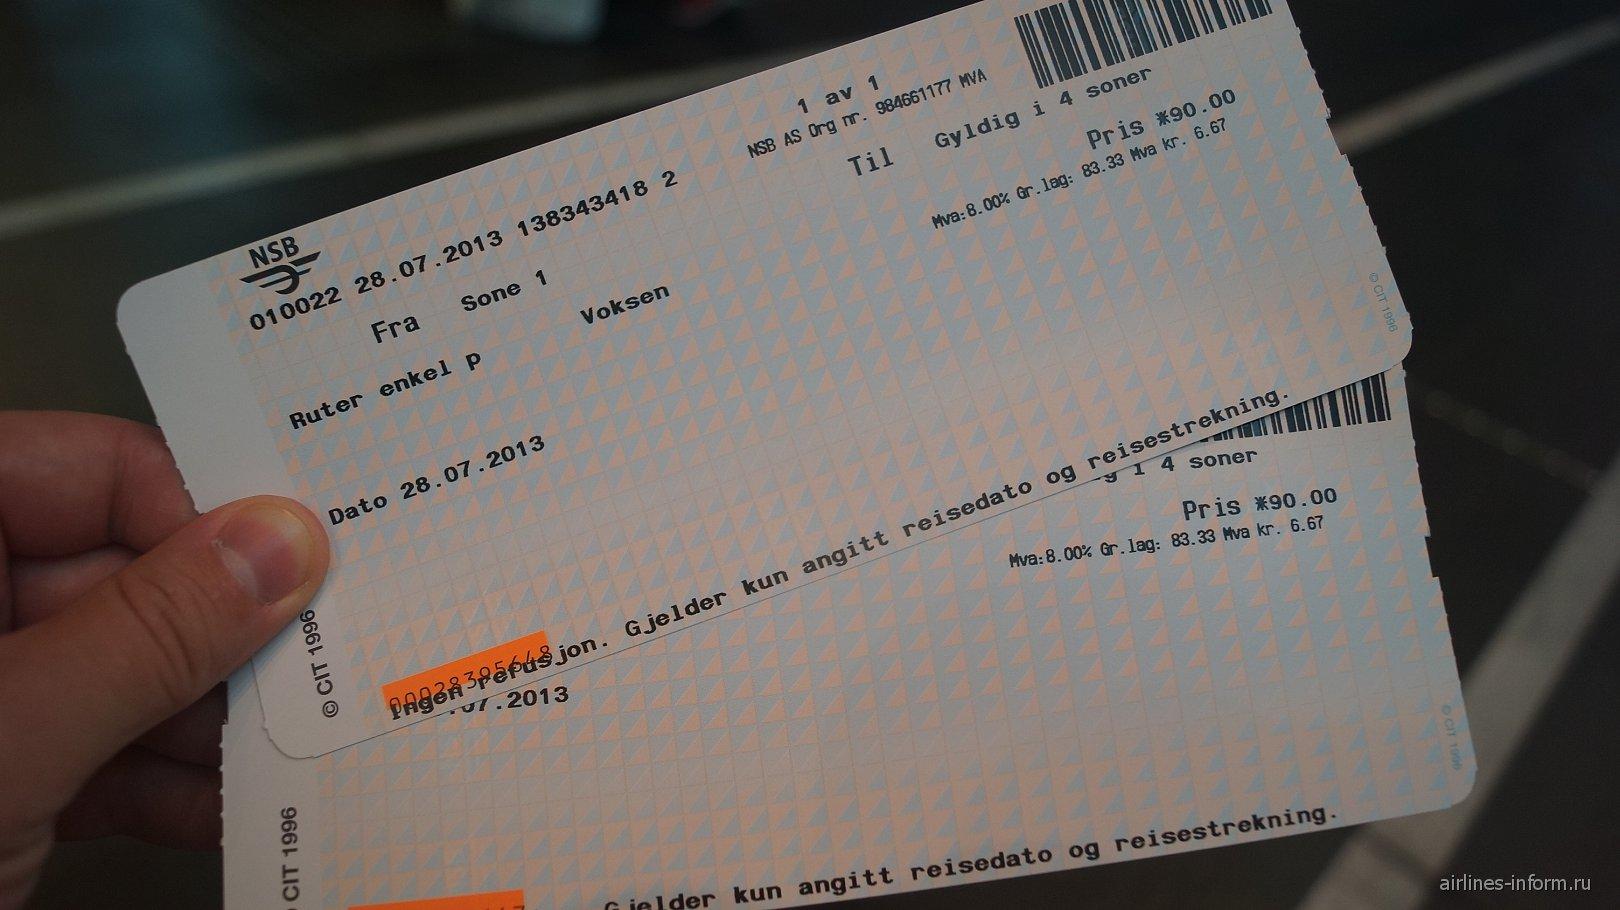 ЖД билеты в аэропорт Осло